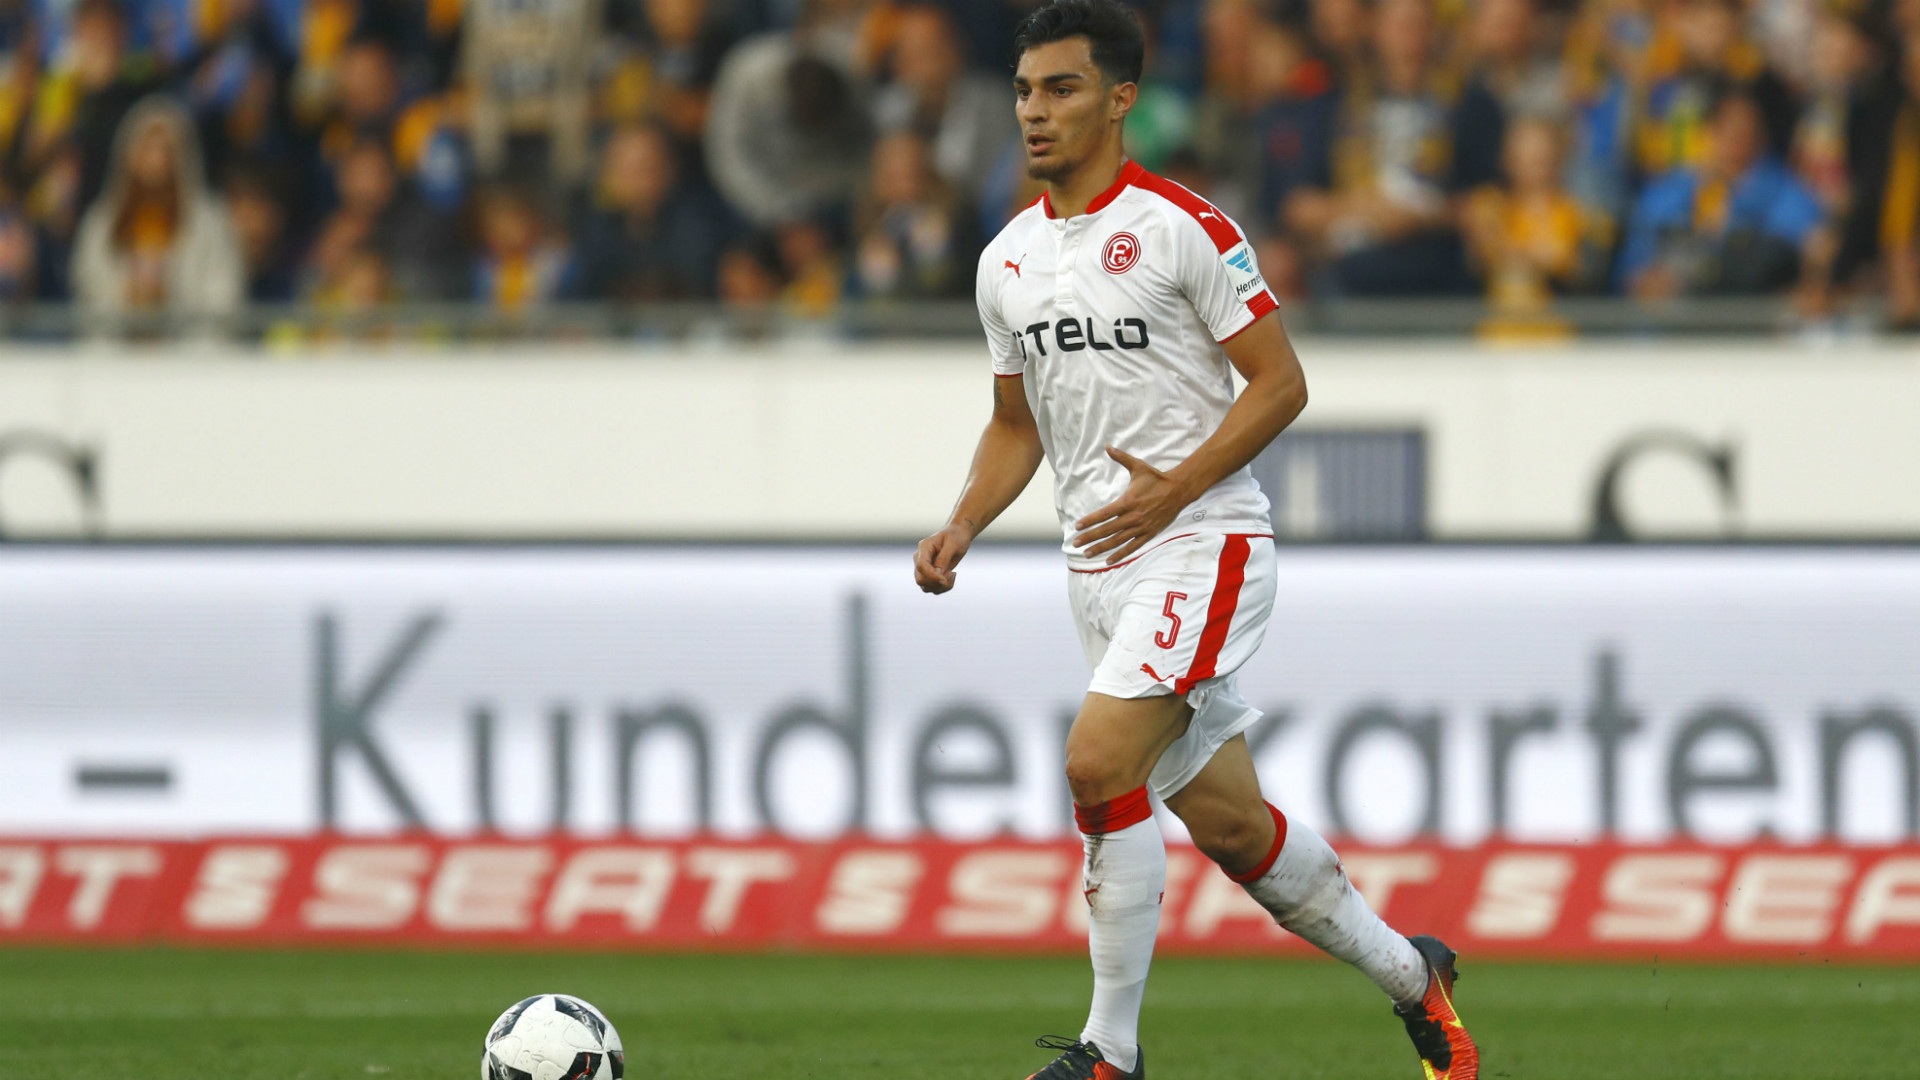 Kaan Ayhan Düsseldorf 2 Bundesliga 23092016